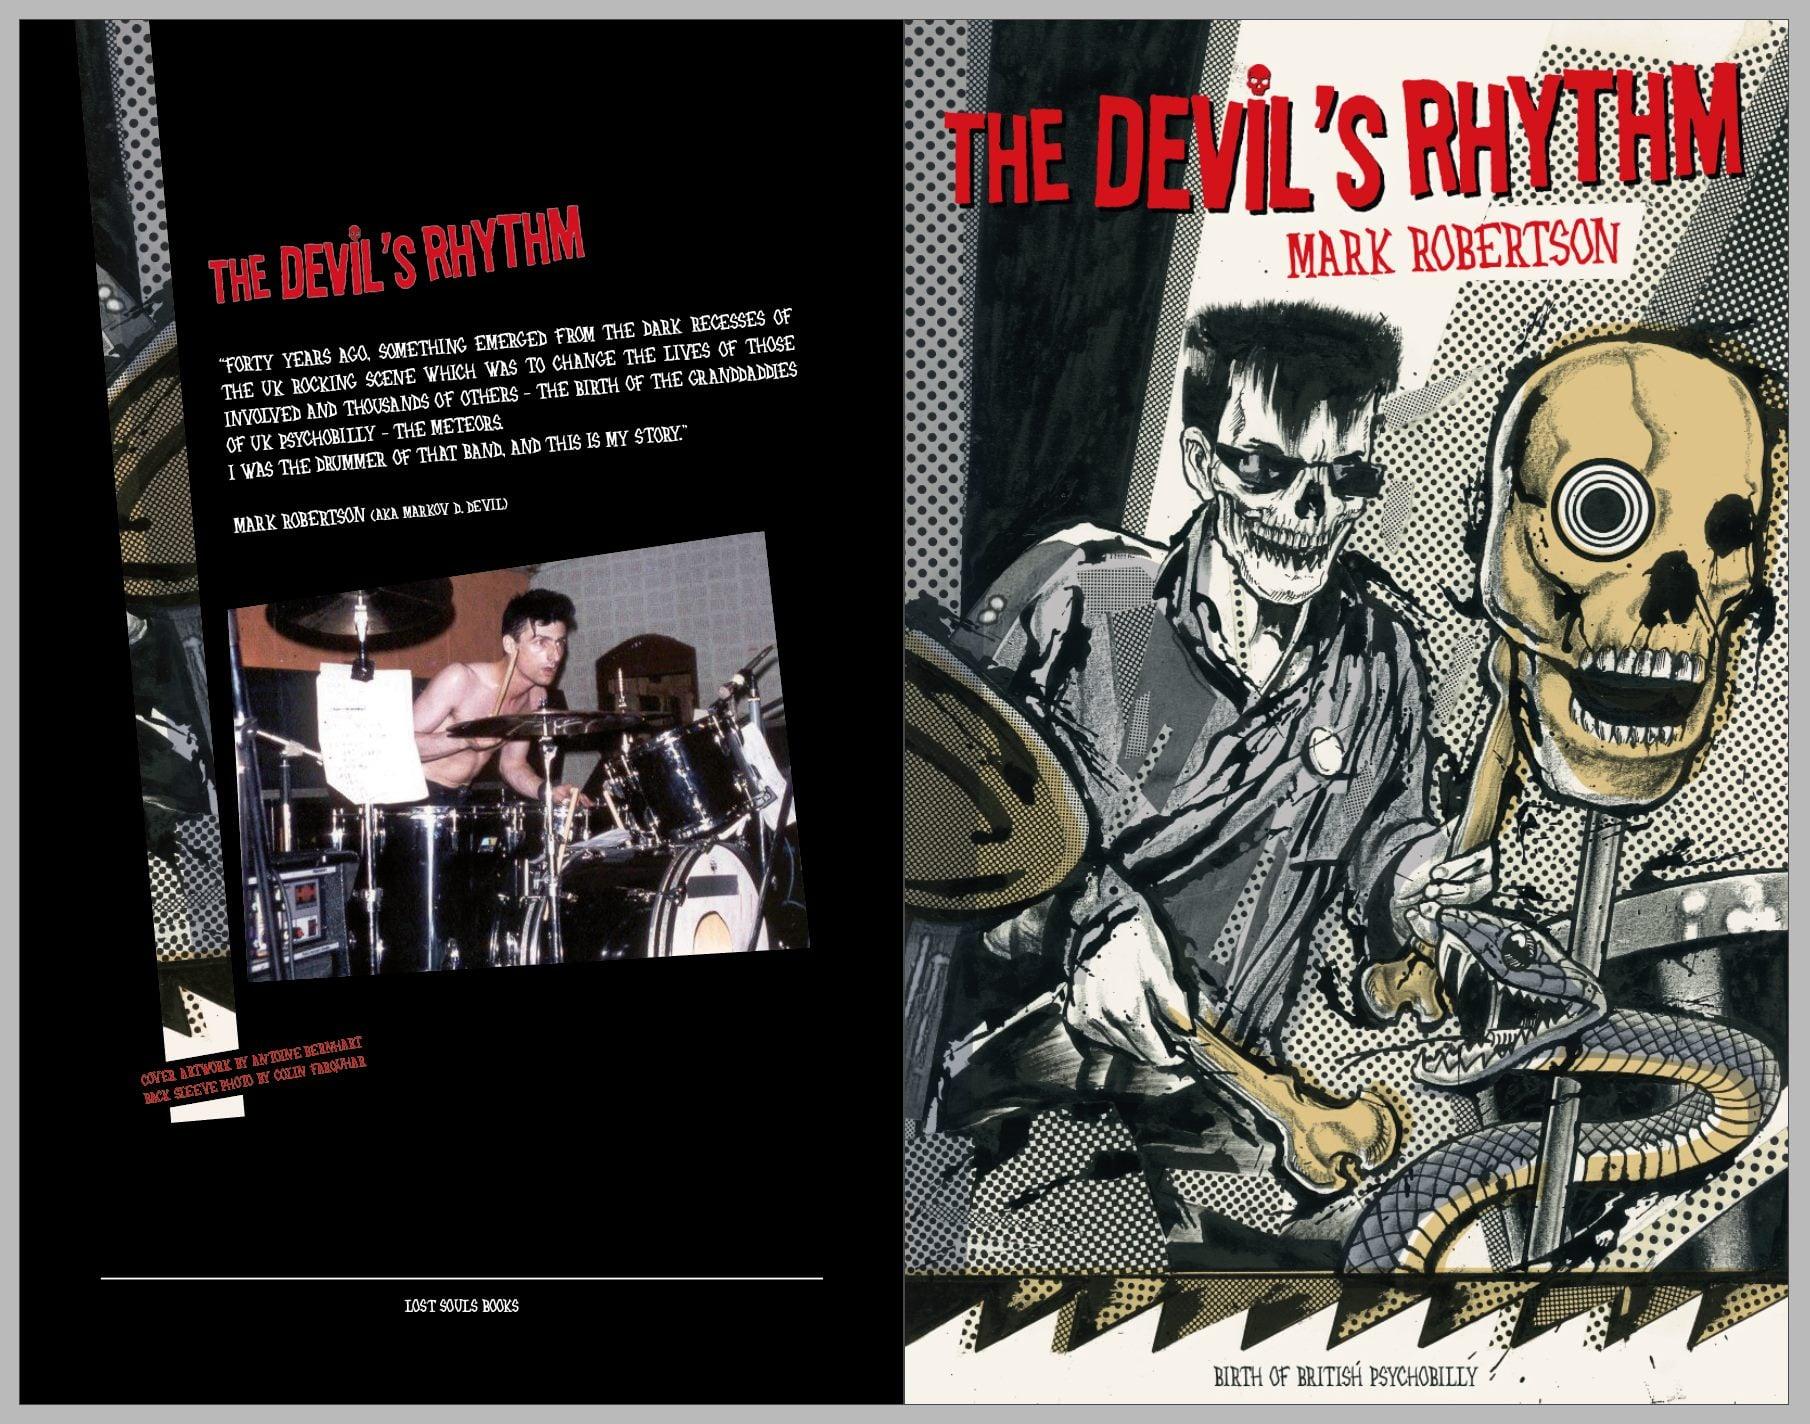 The Devil's Rhythm